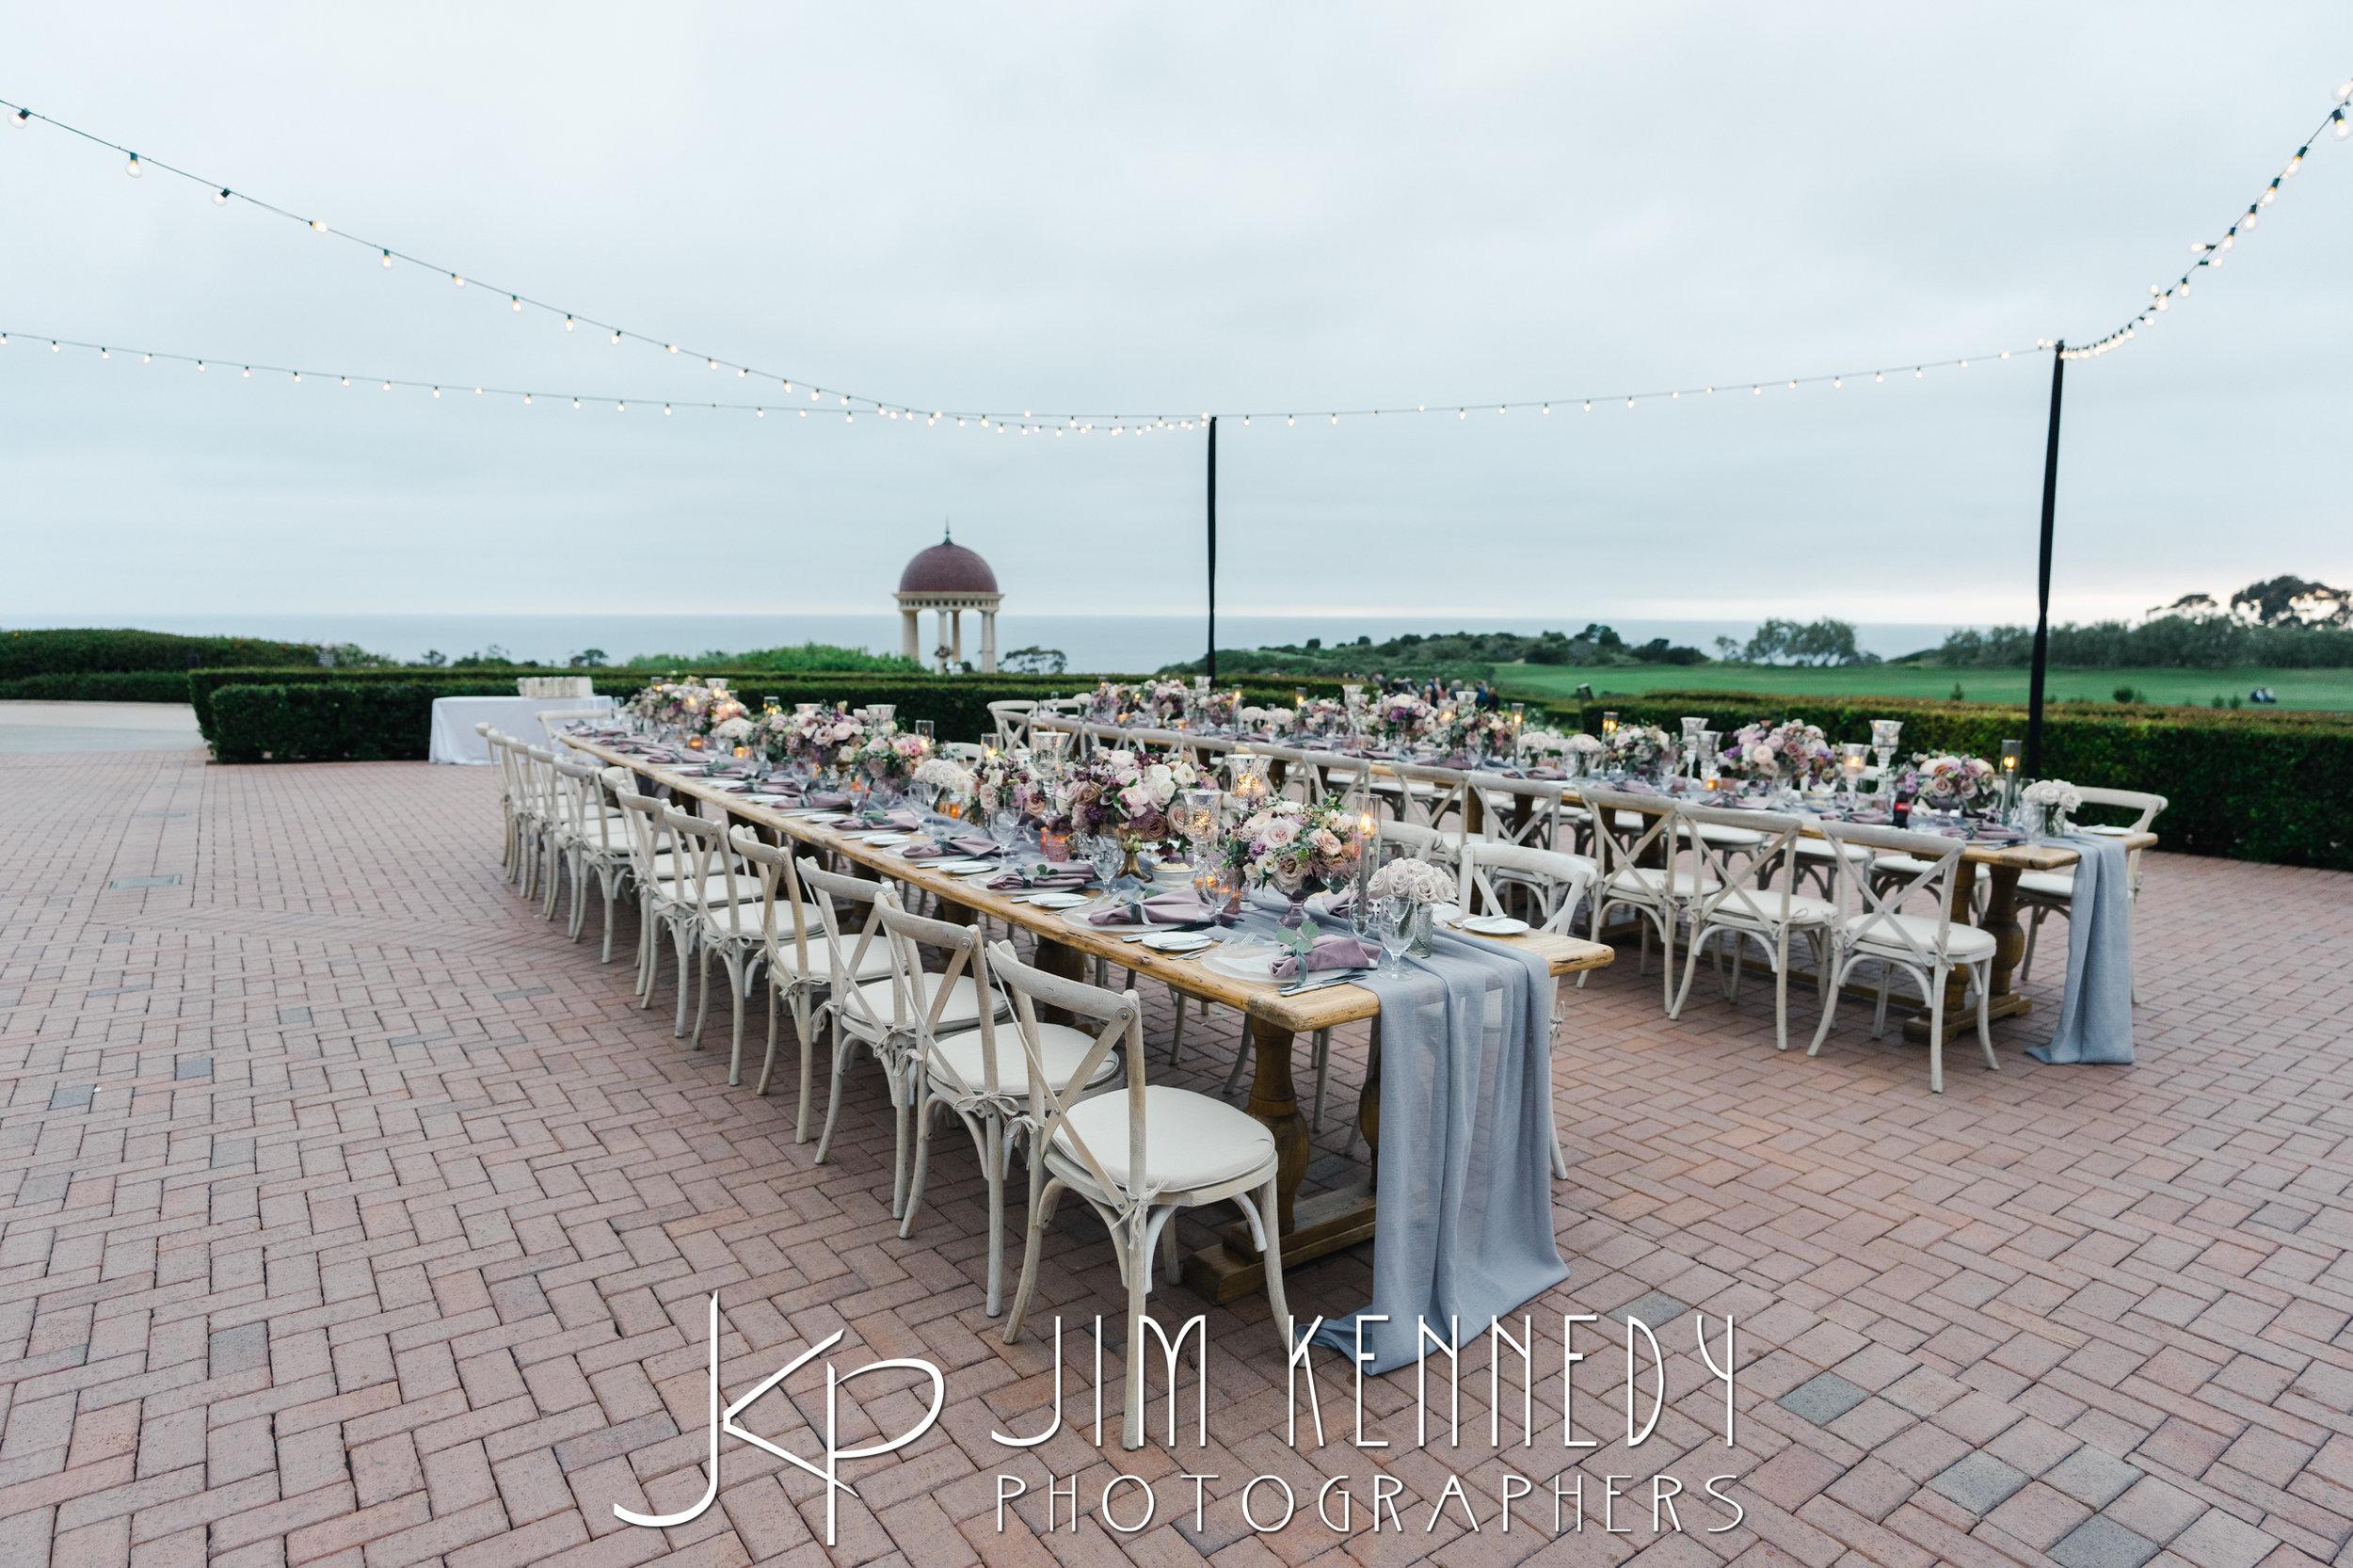 pelican-hill-wedding-jim-kenedy-photographers_0208.JPG